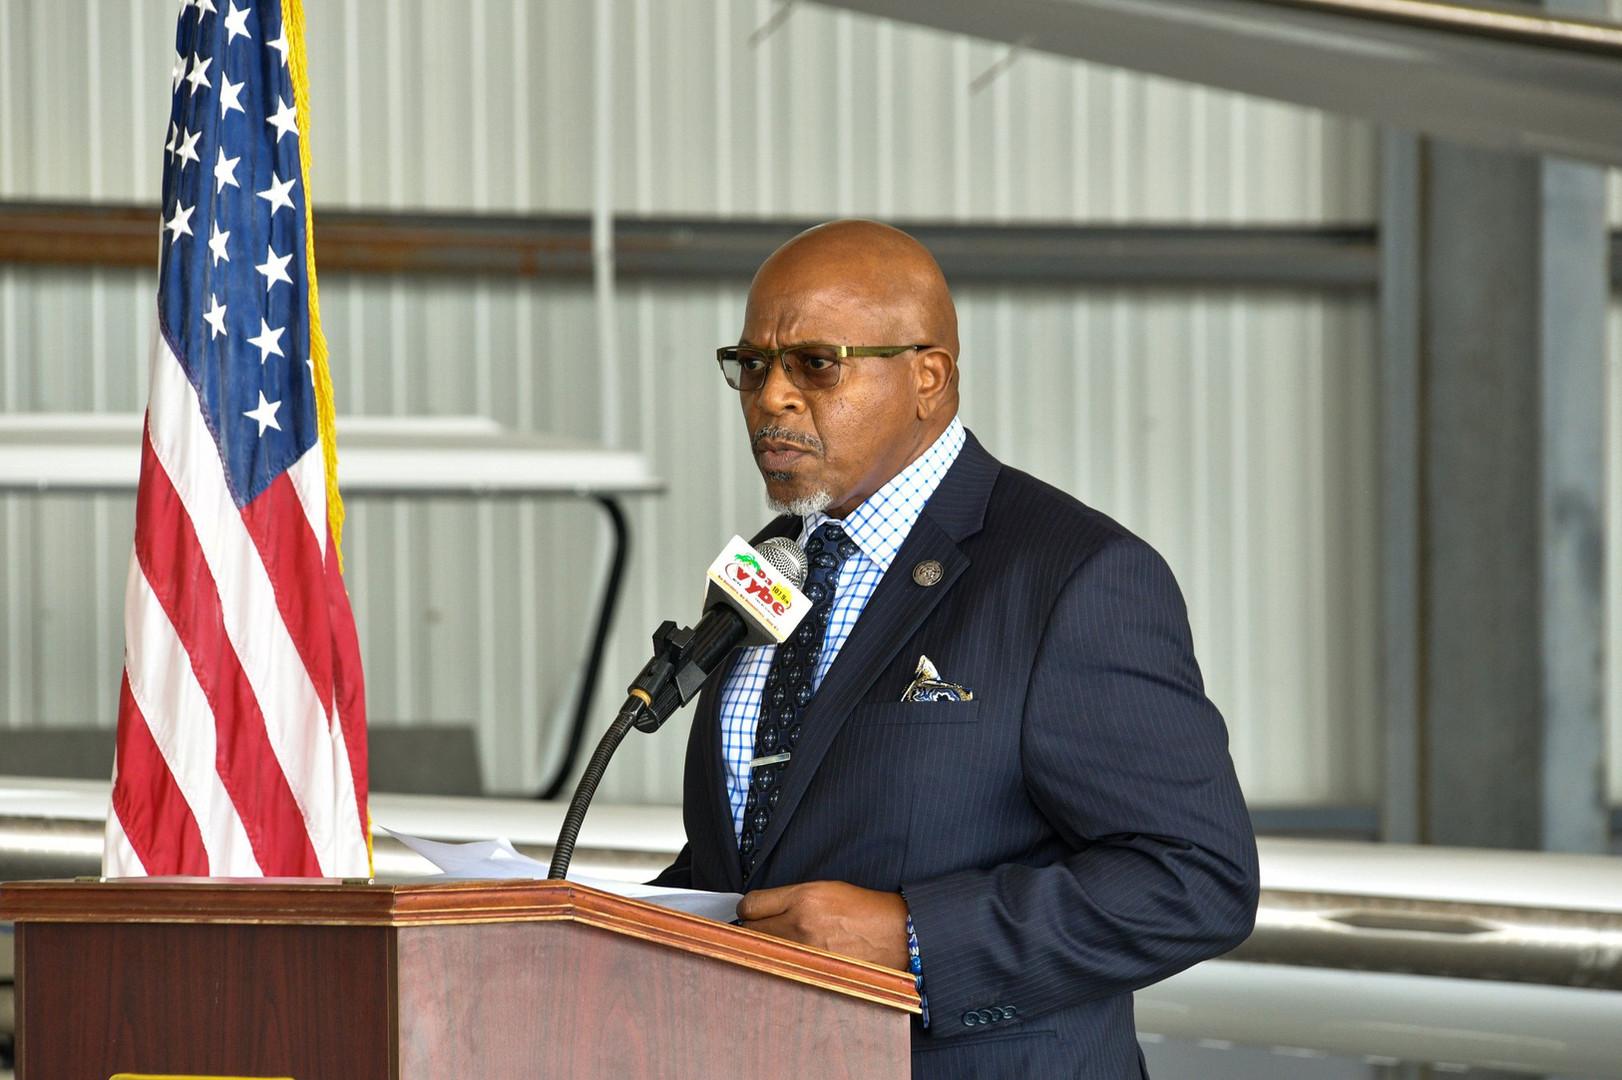 Senate Vice President Myron Jackson